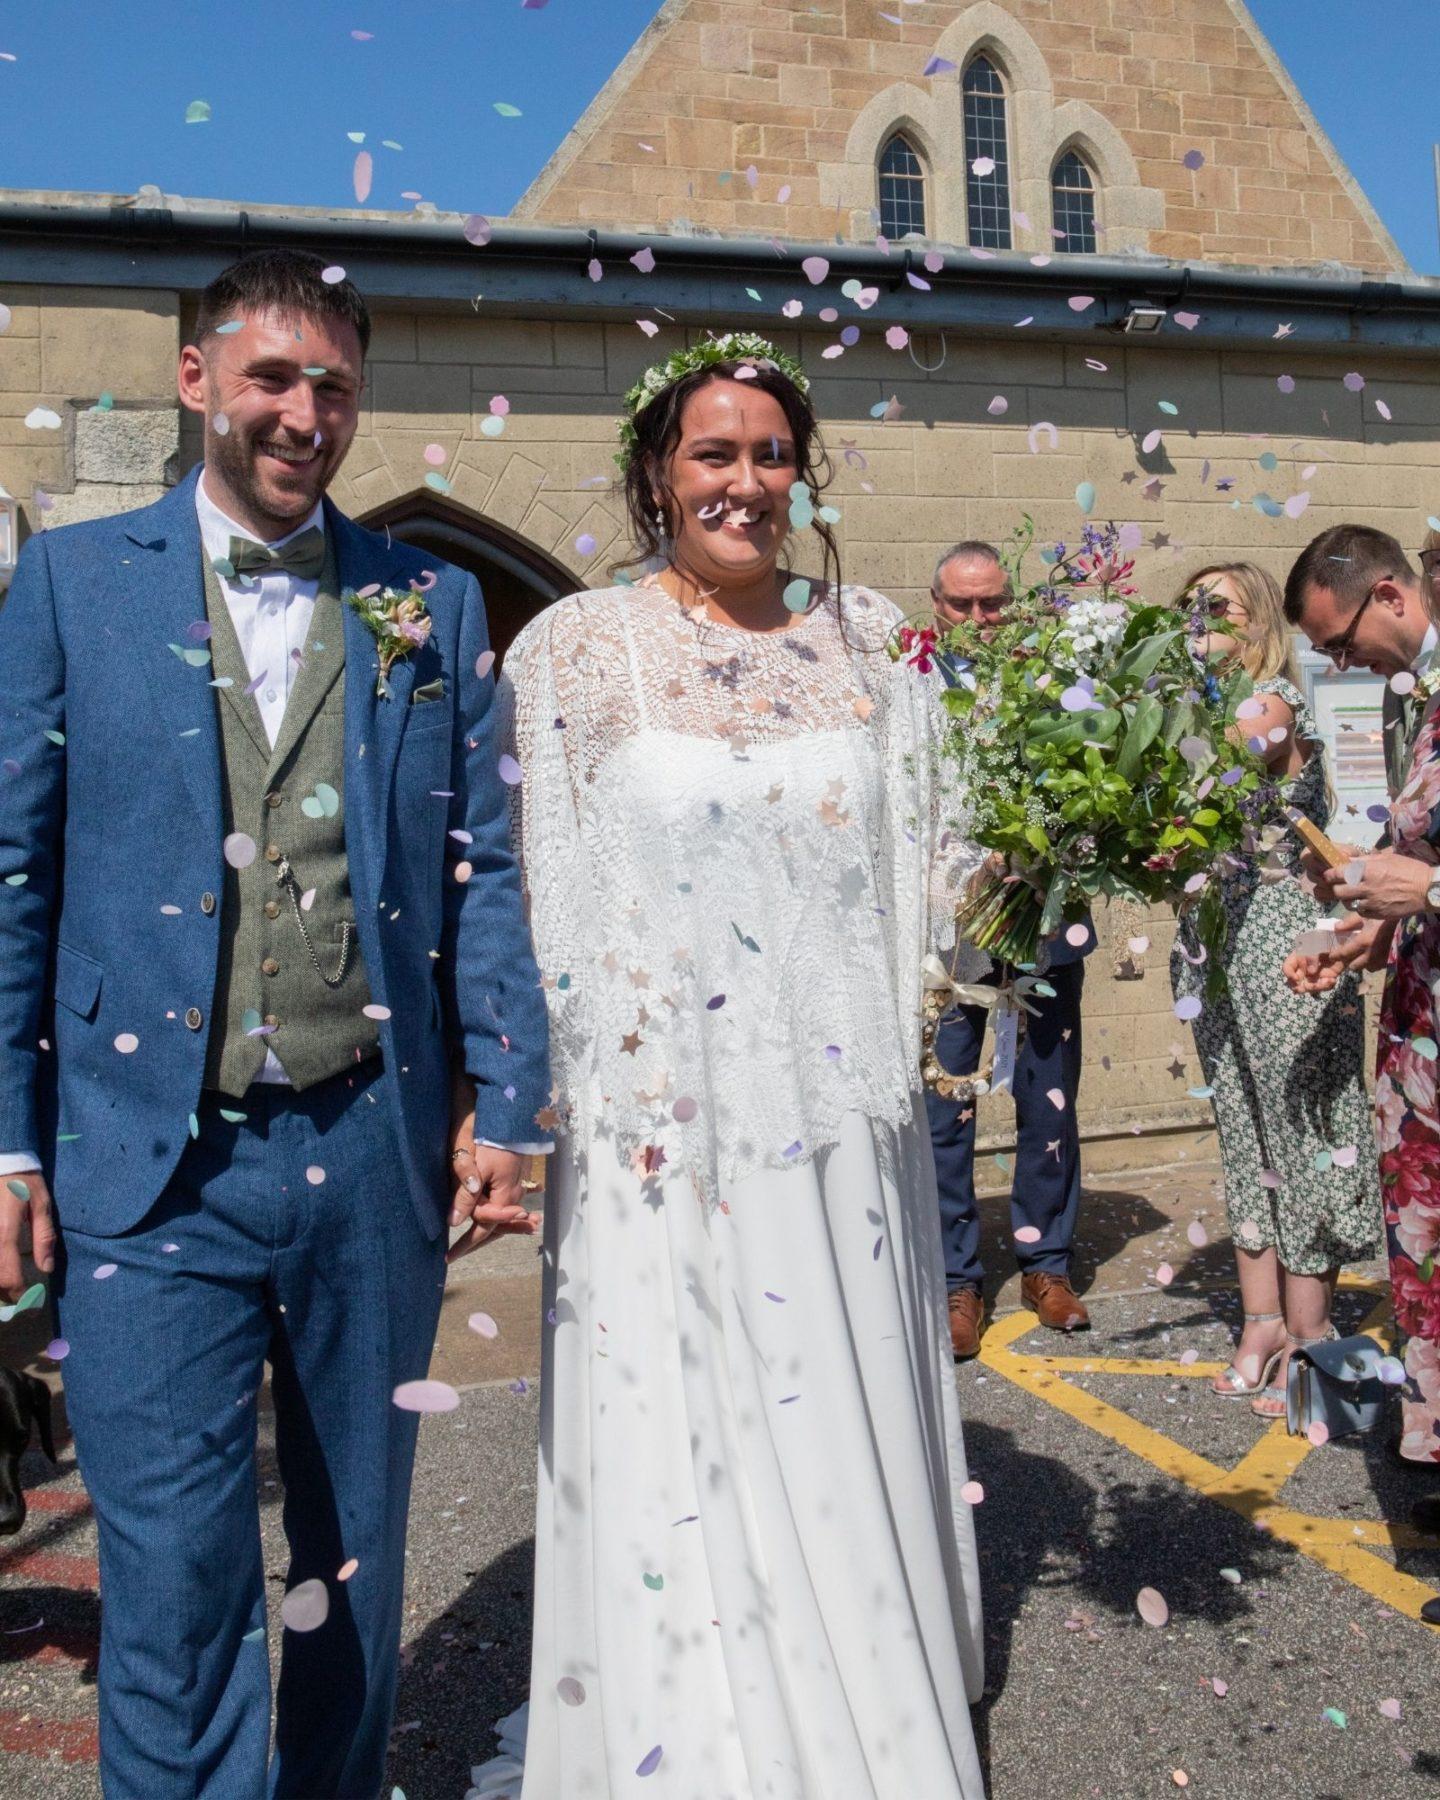 Bespoke wedding dress service Stratford